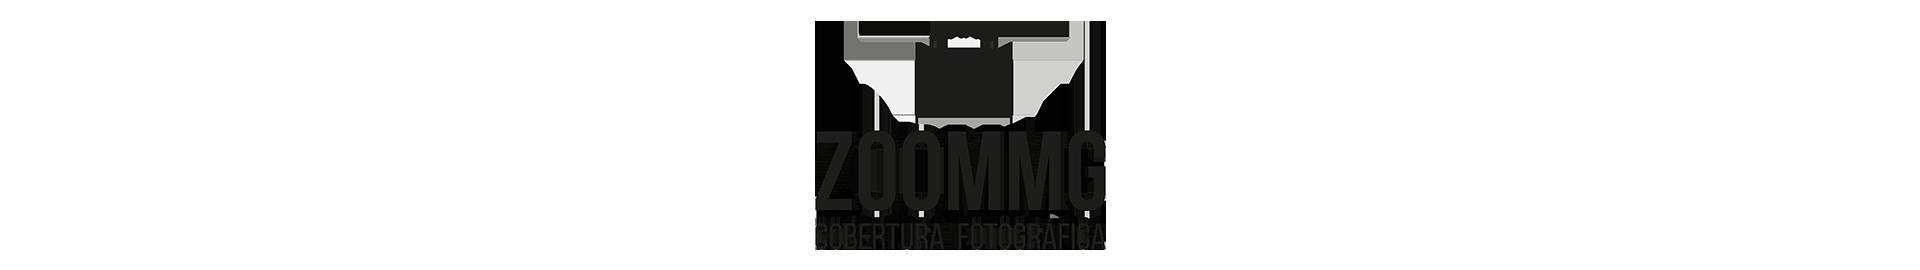 Contate ZOOMMG Fotos de festas infantis, 15 Anos, eventos e casamento